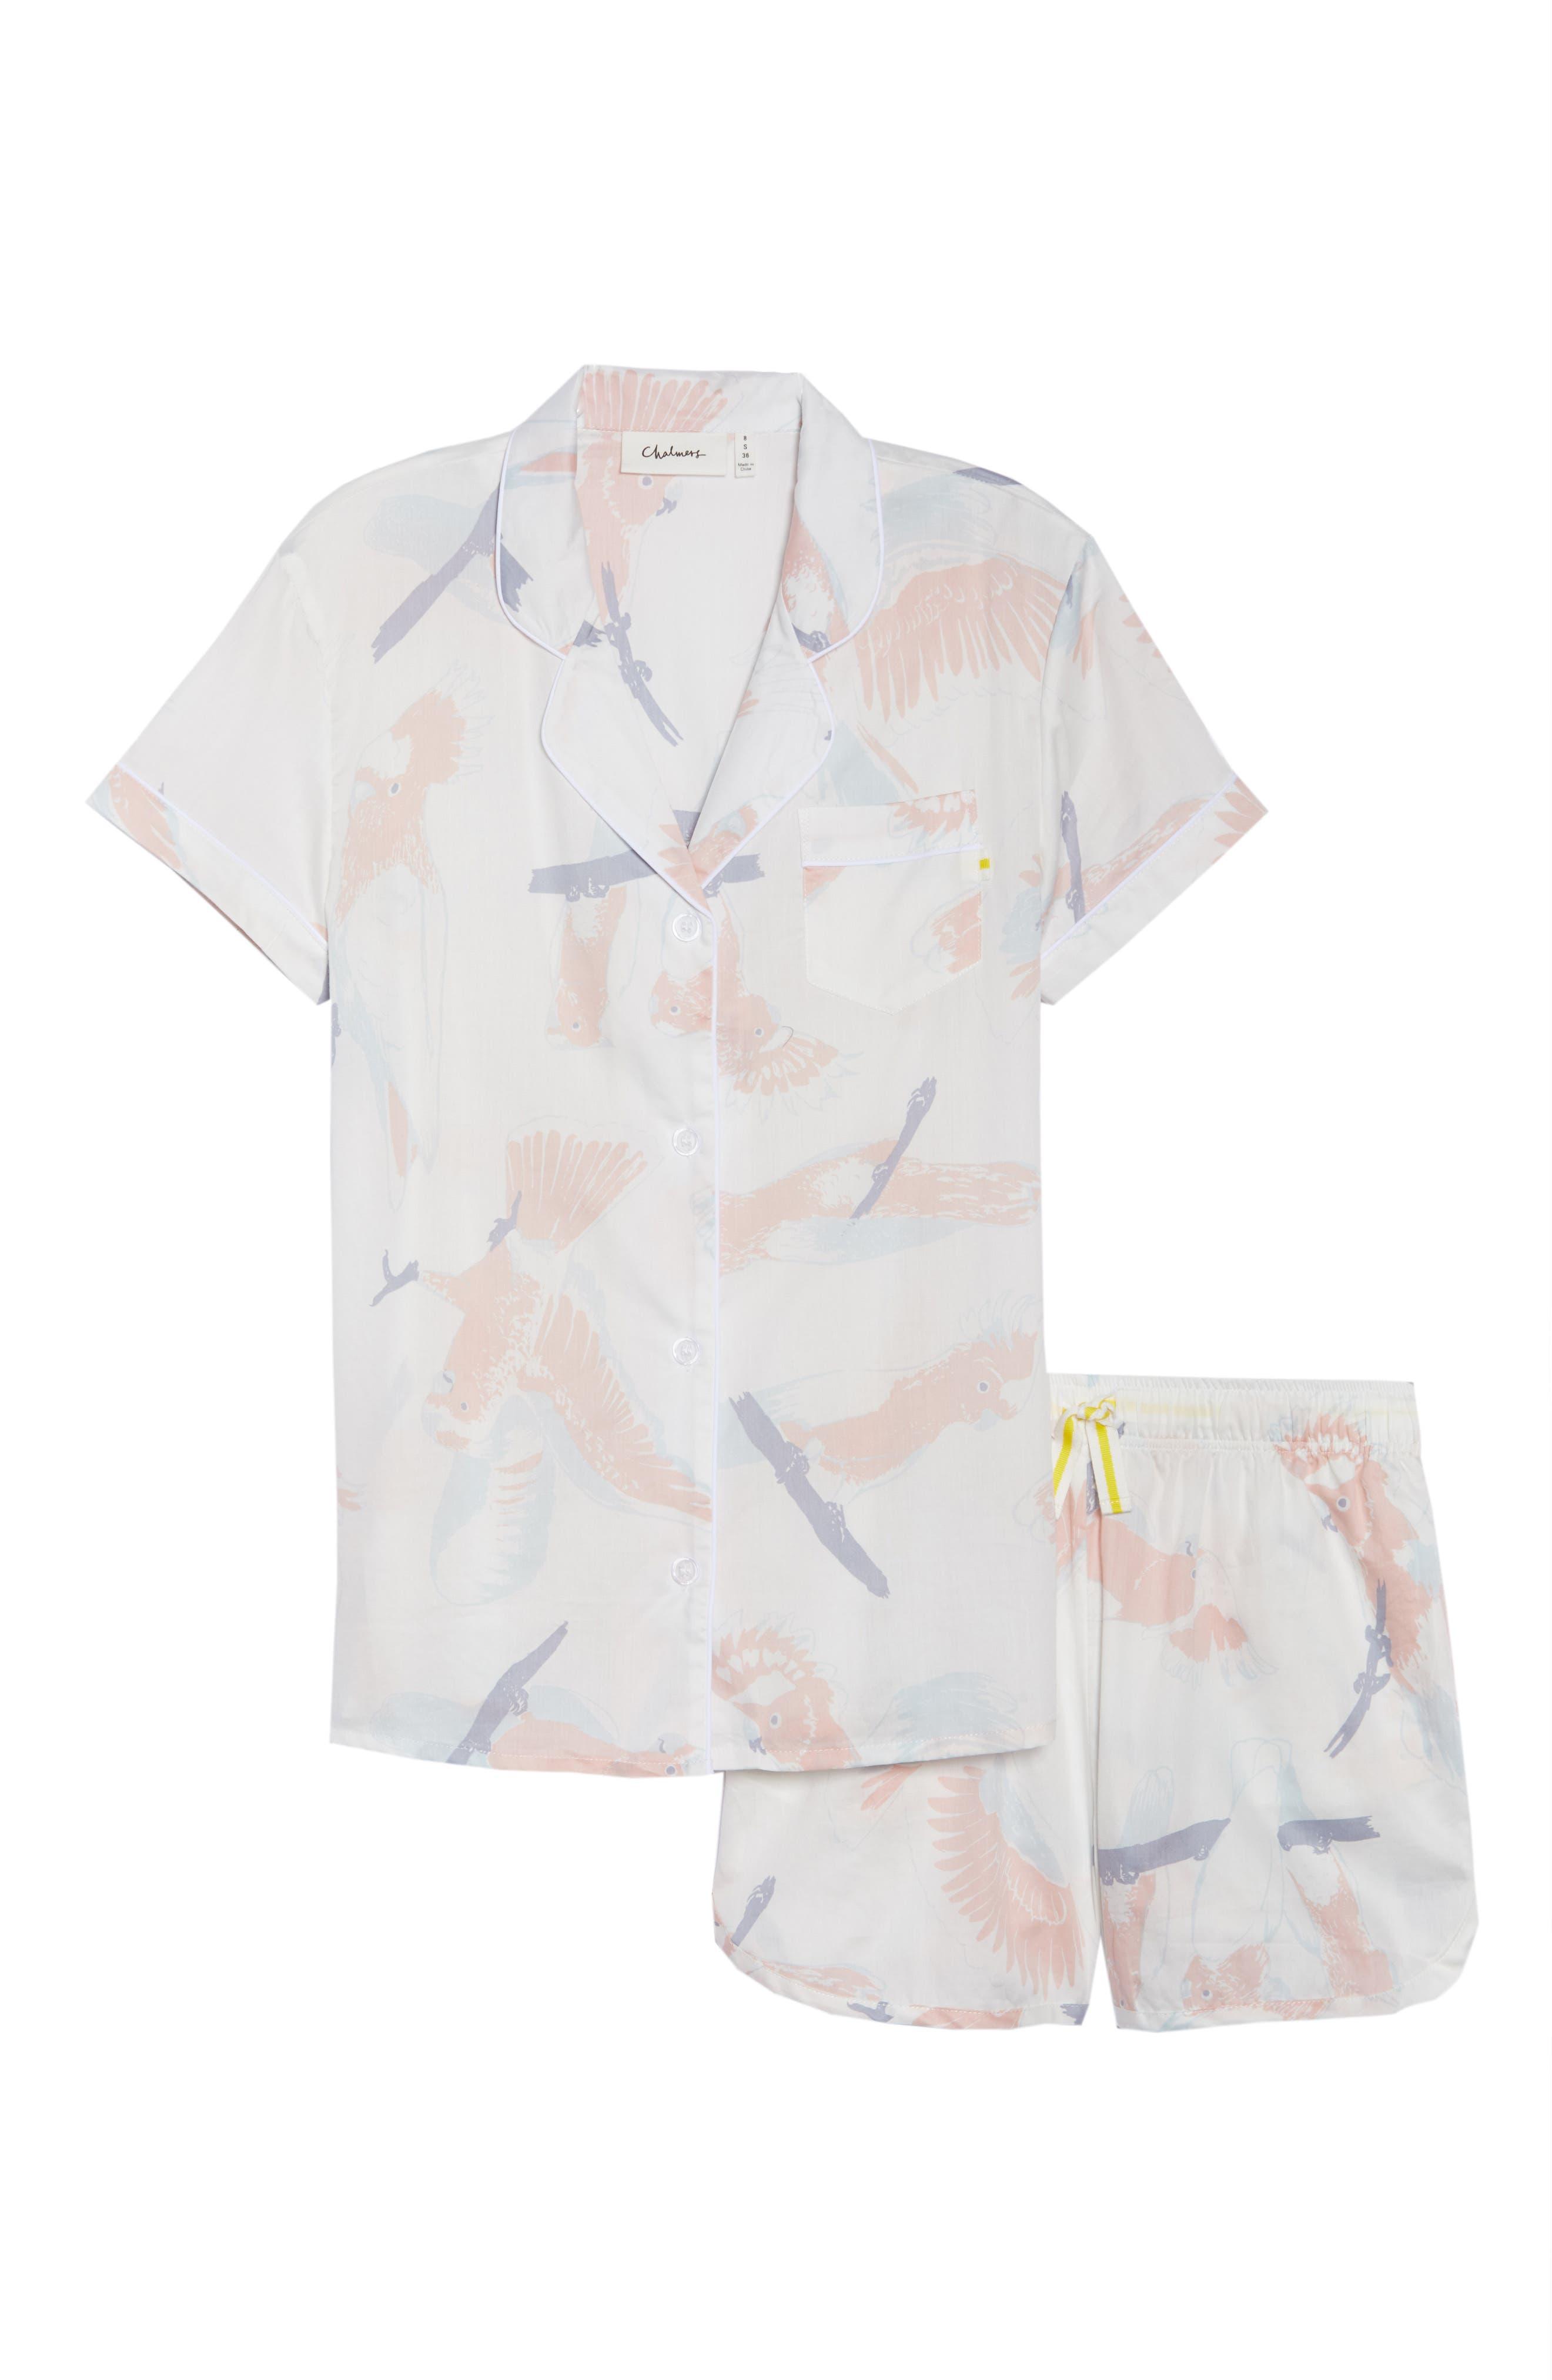 Cockatoos Short Pajamas,                             Alternate thumbnail 4, color,                             Cockatoos White